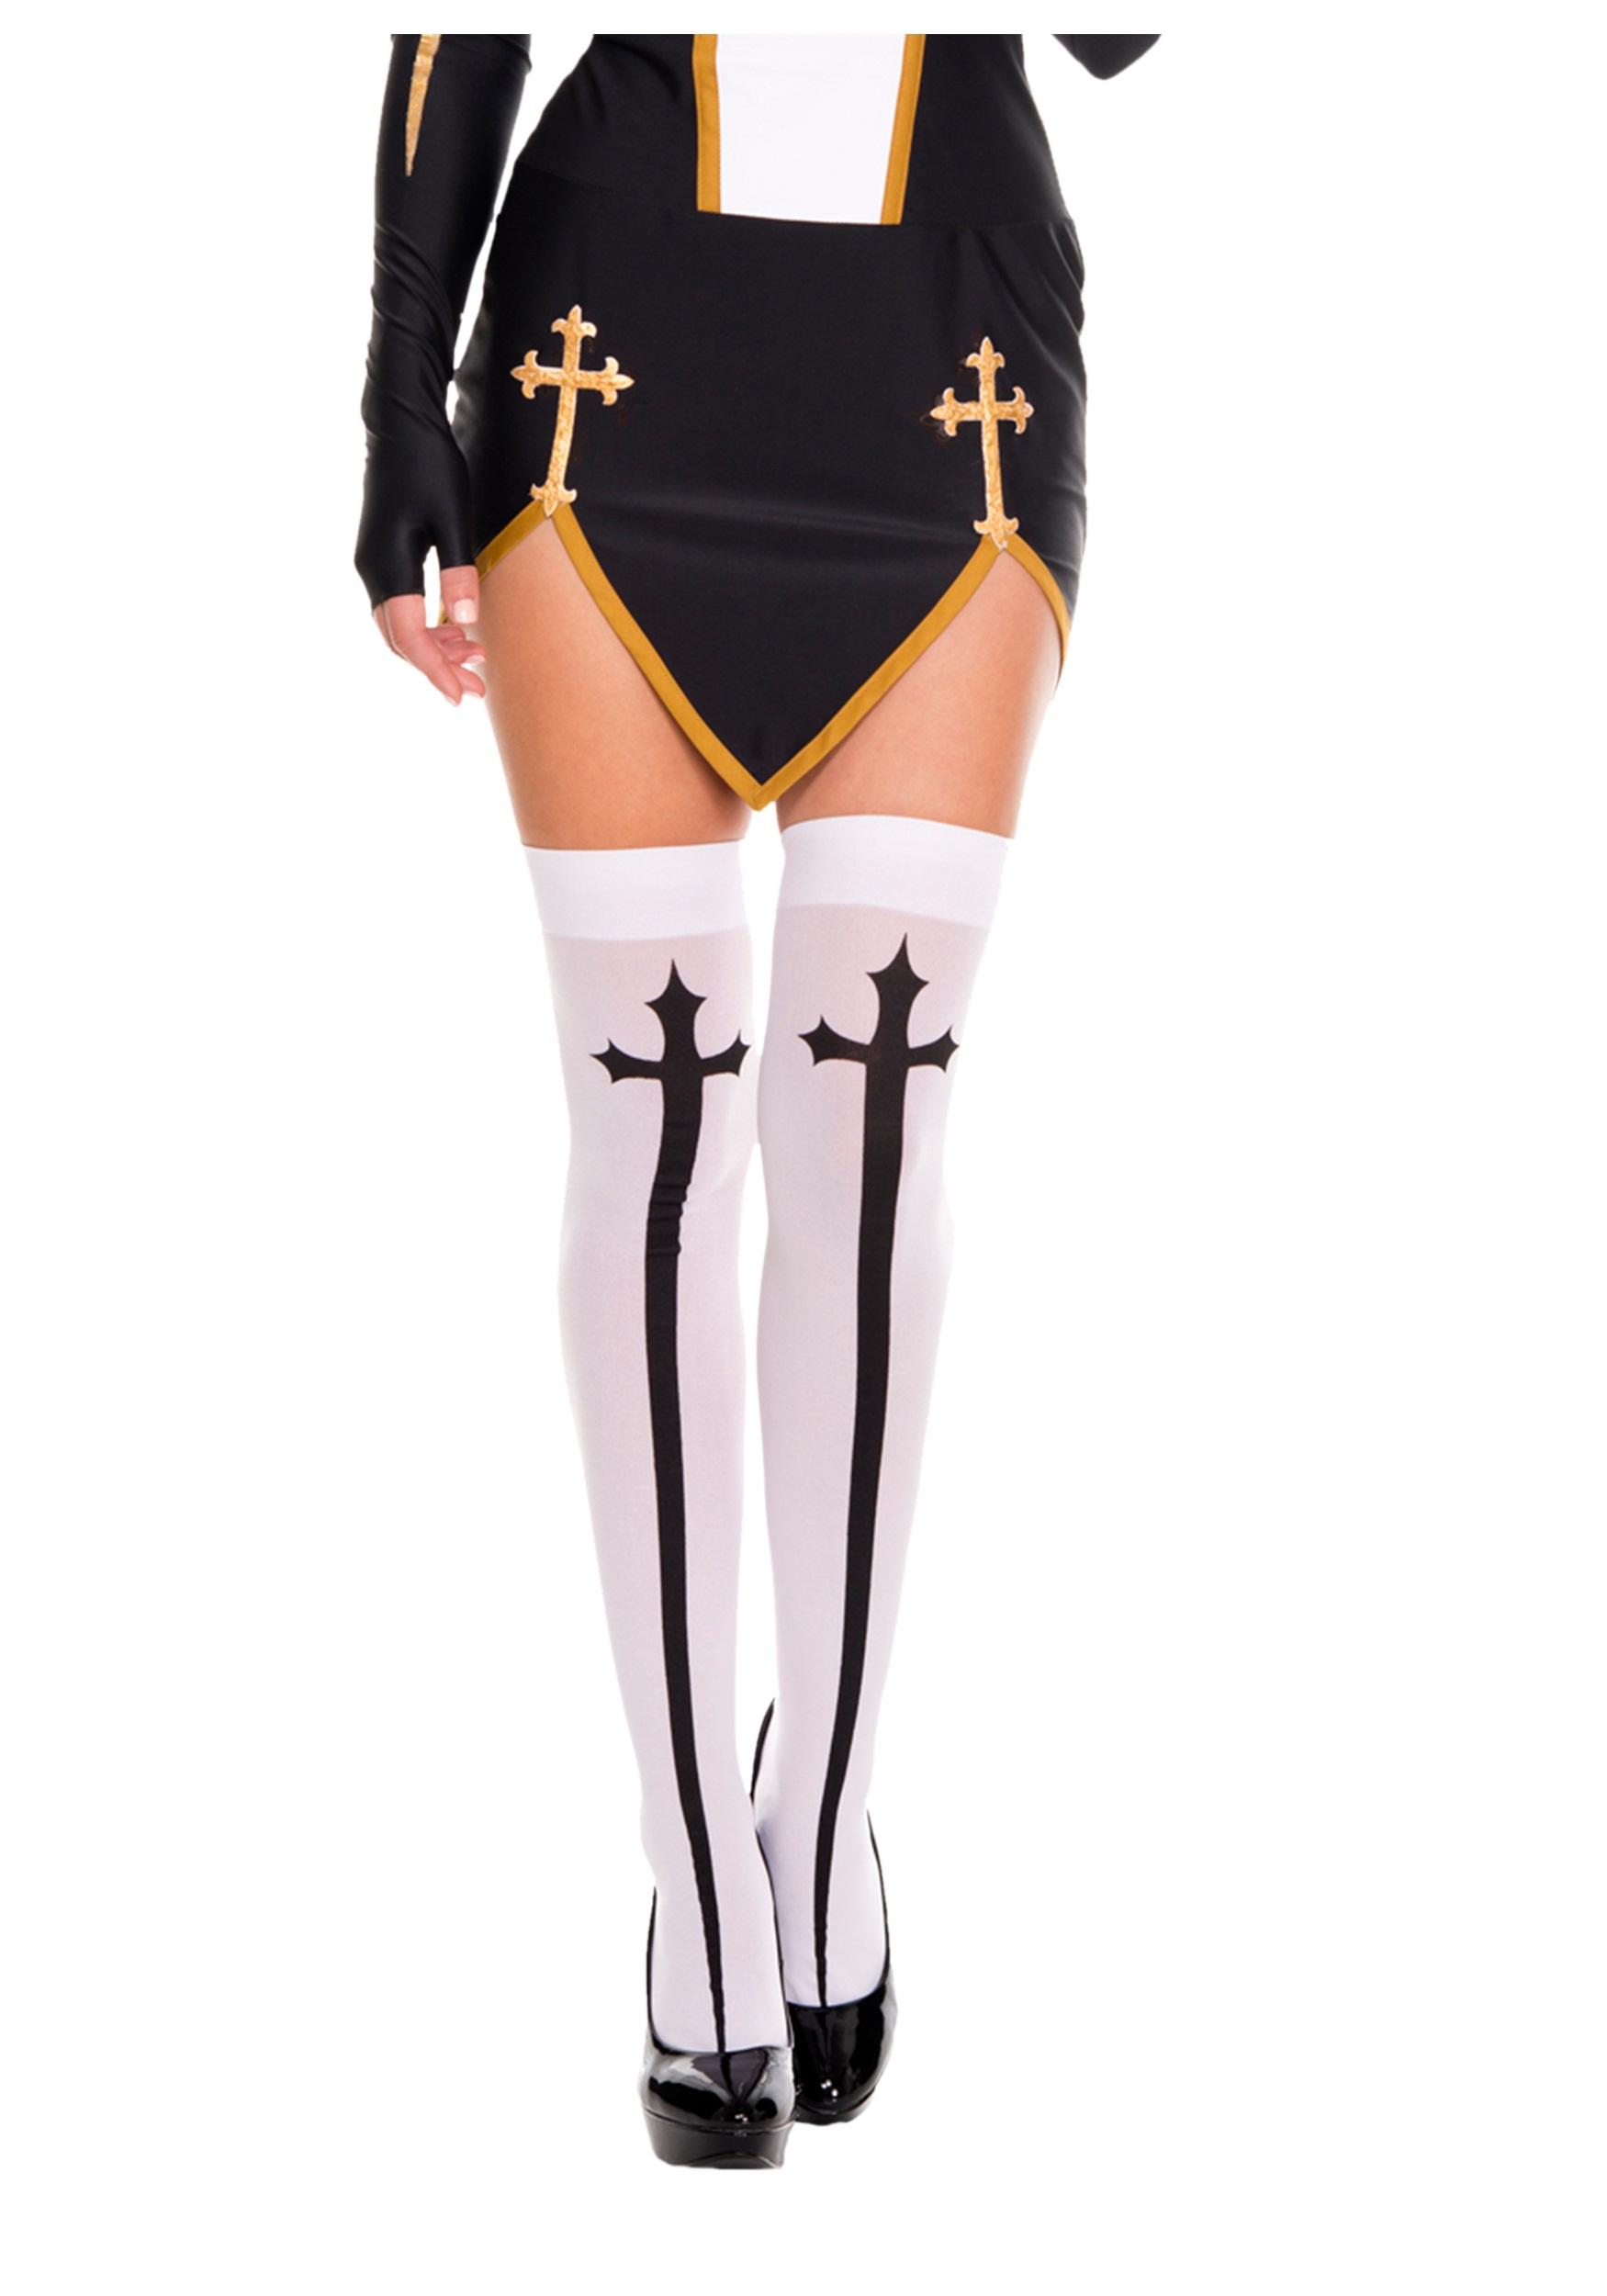 be73312f0da2 gothic-cross-thigh-high-stockings.jpg